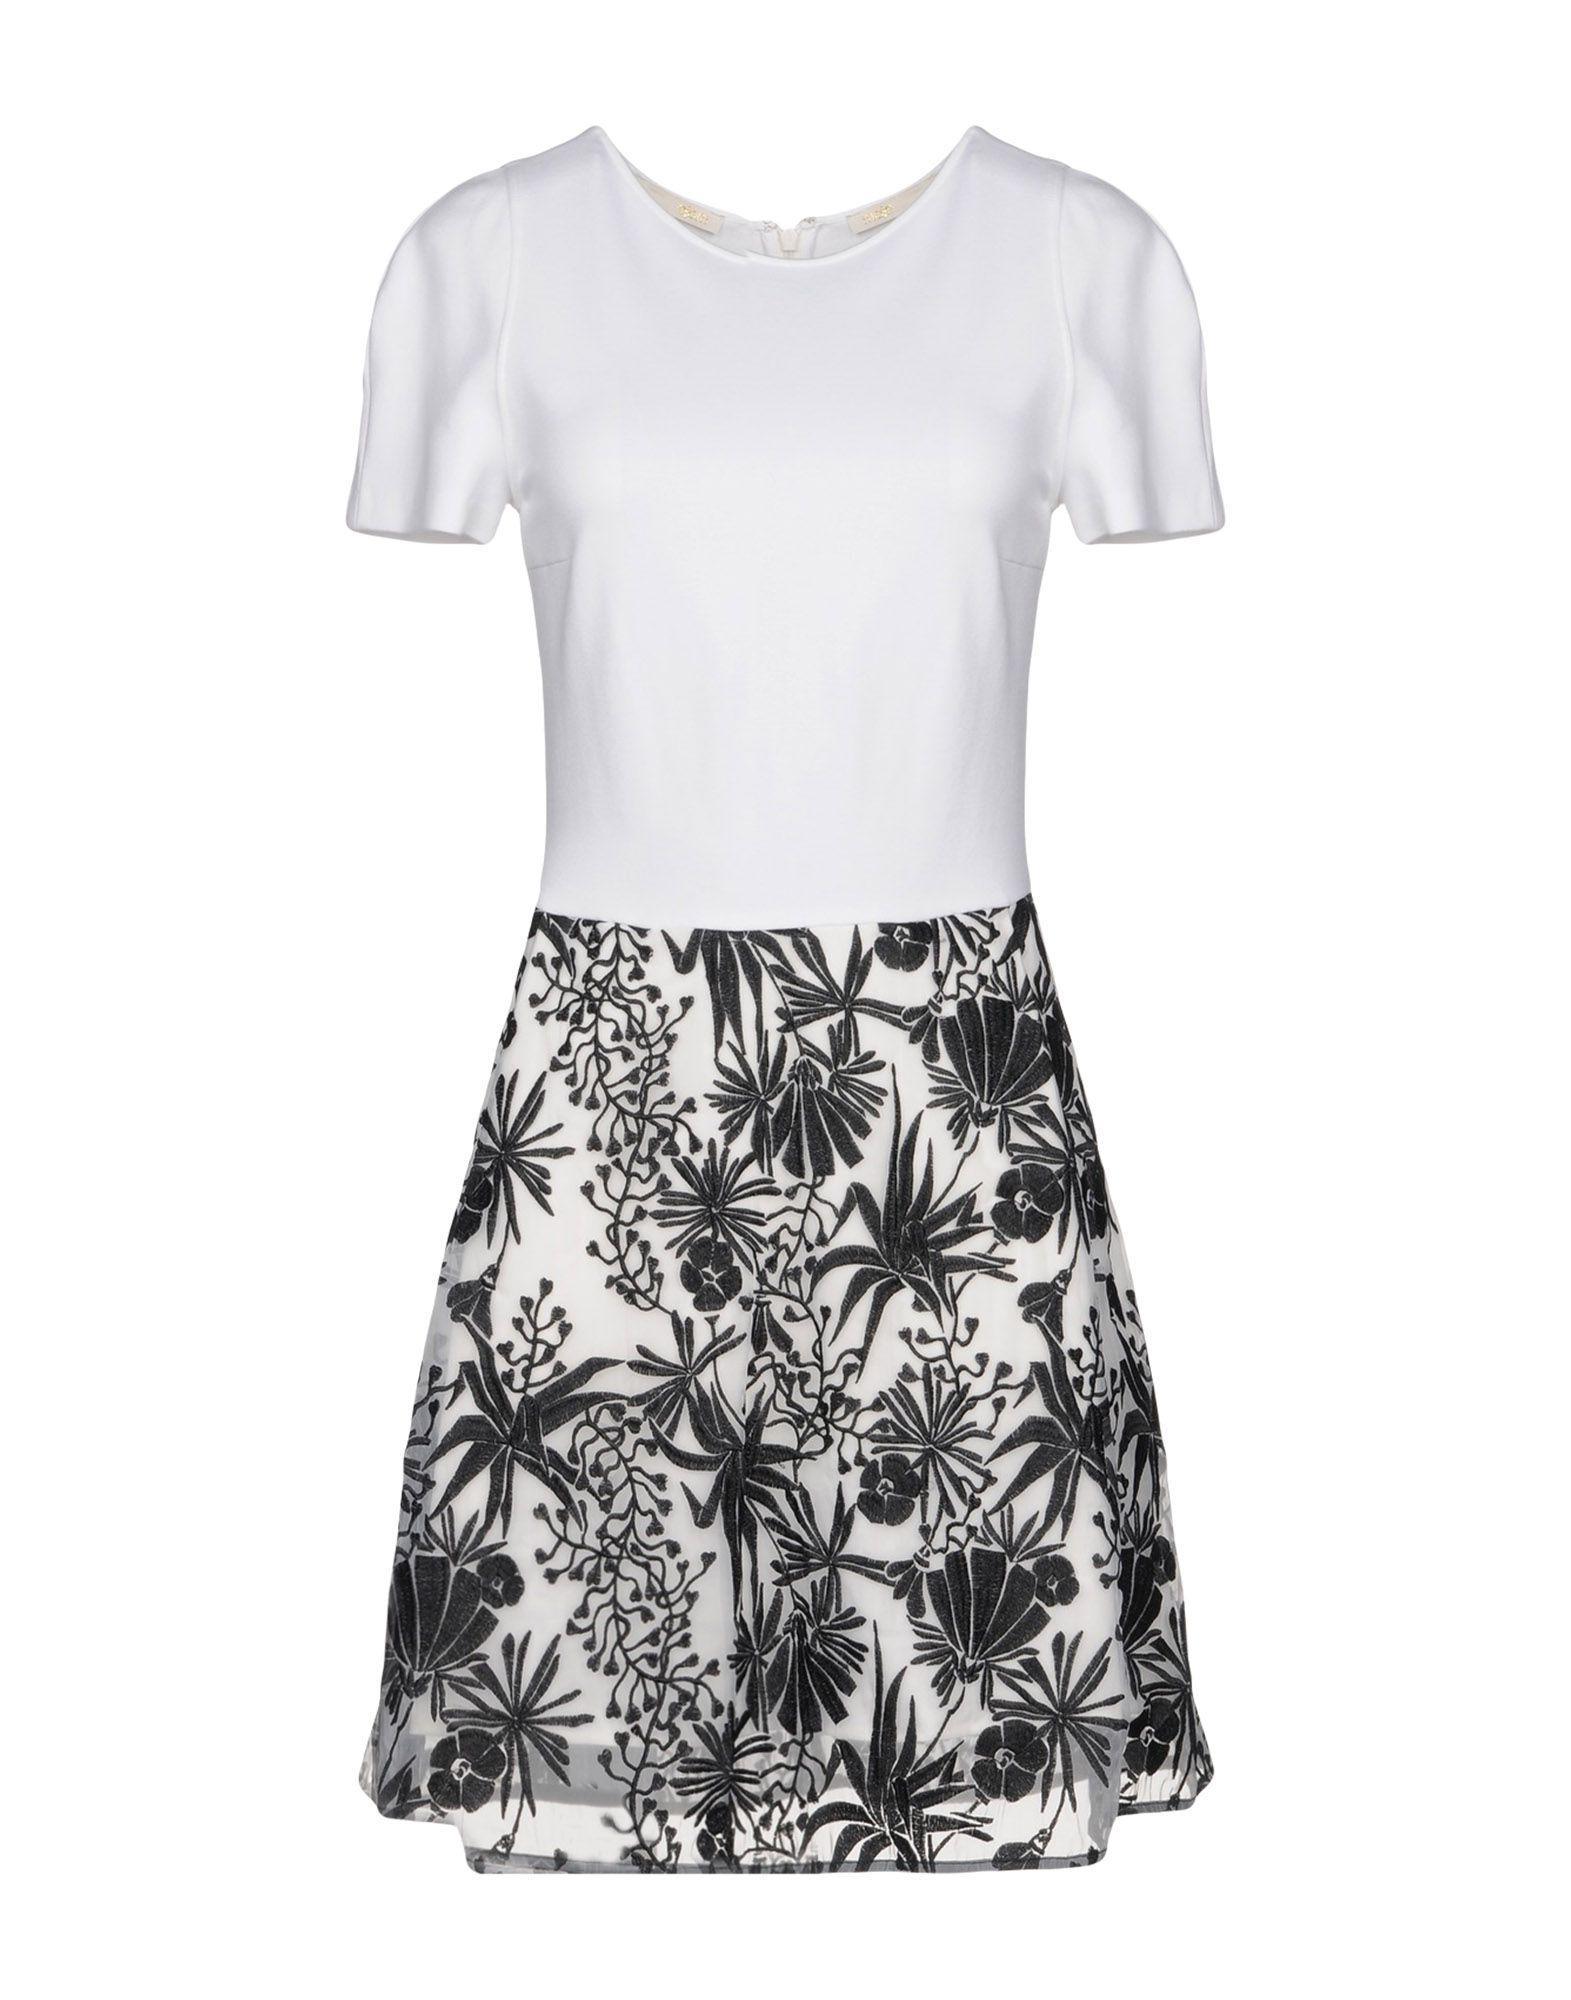 Maje Short Dresses In White